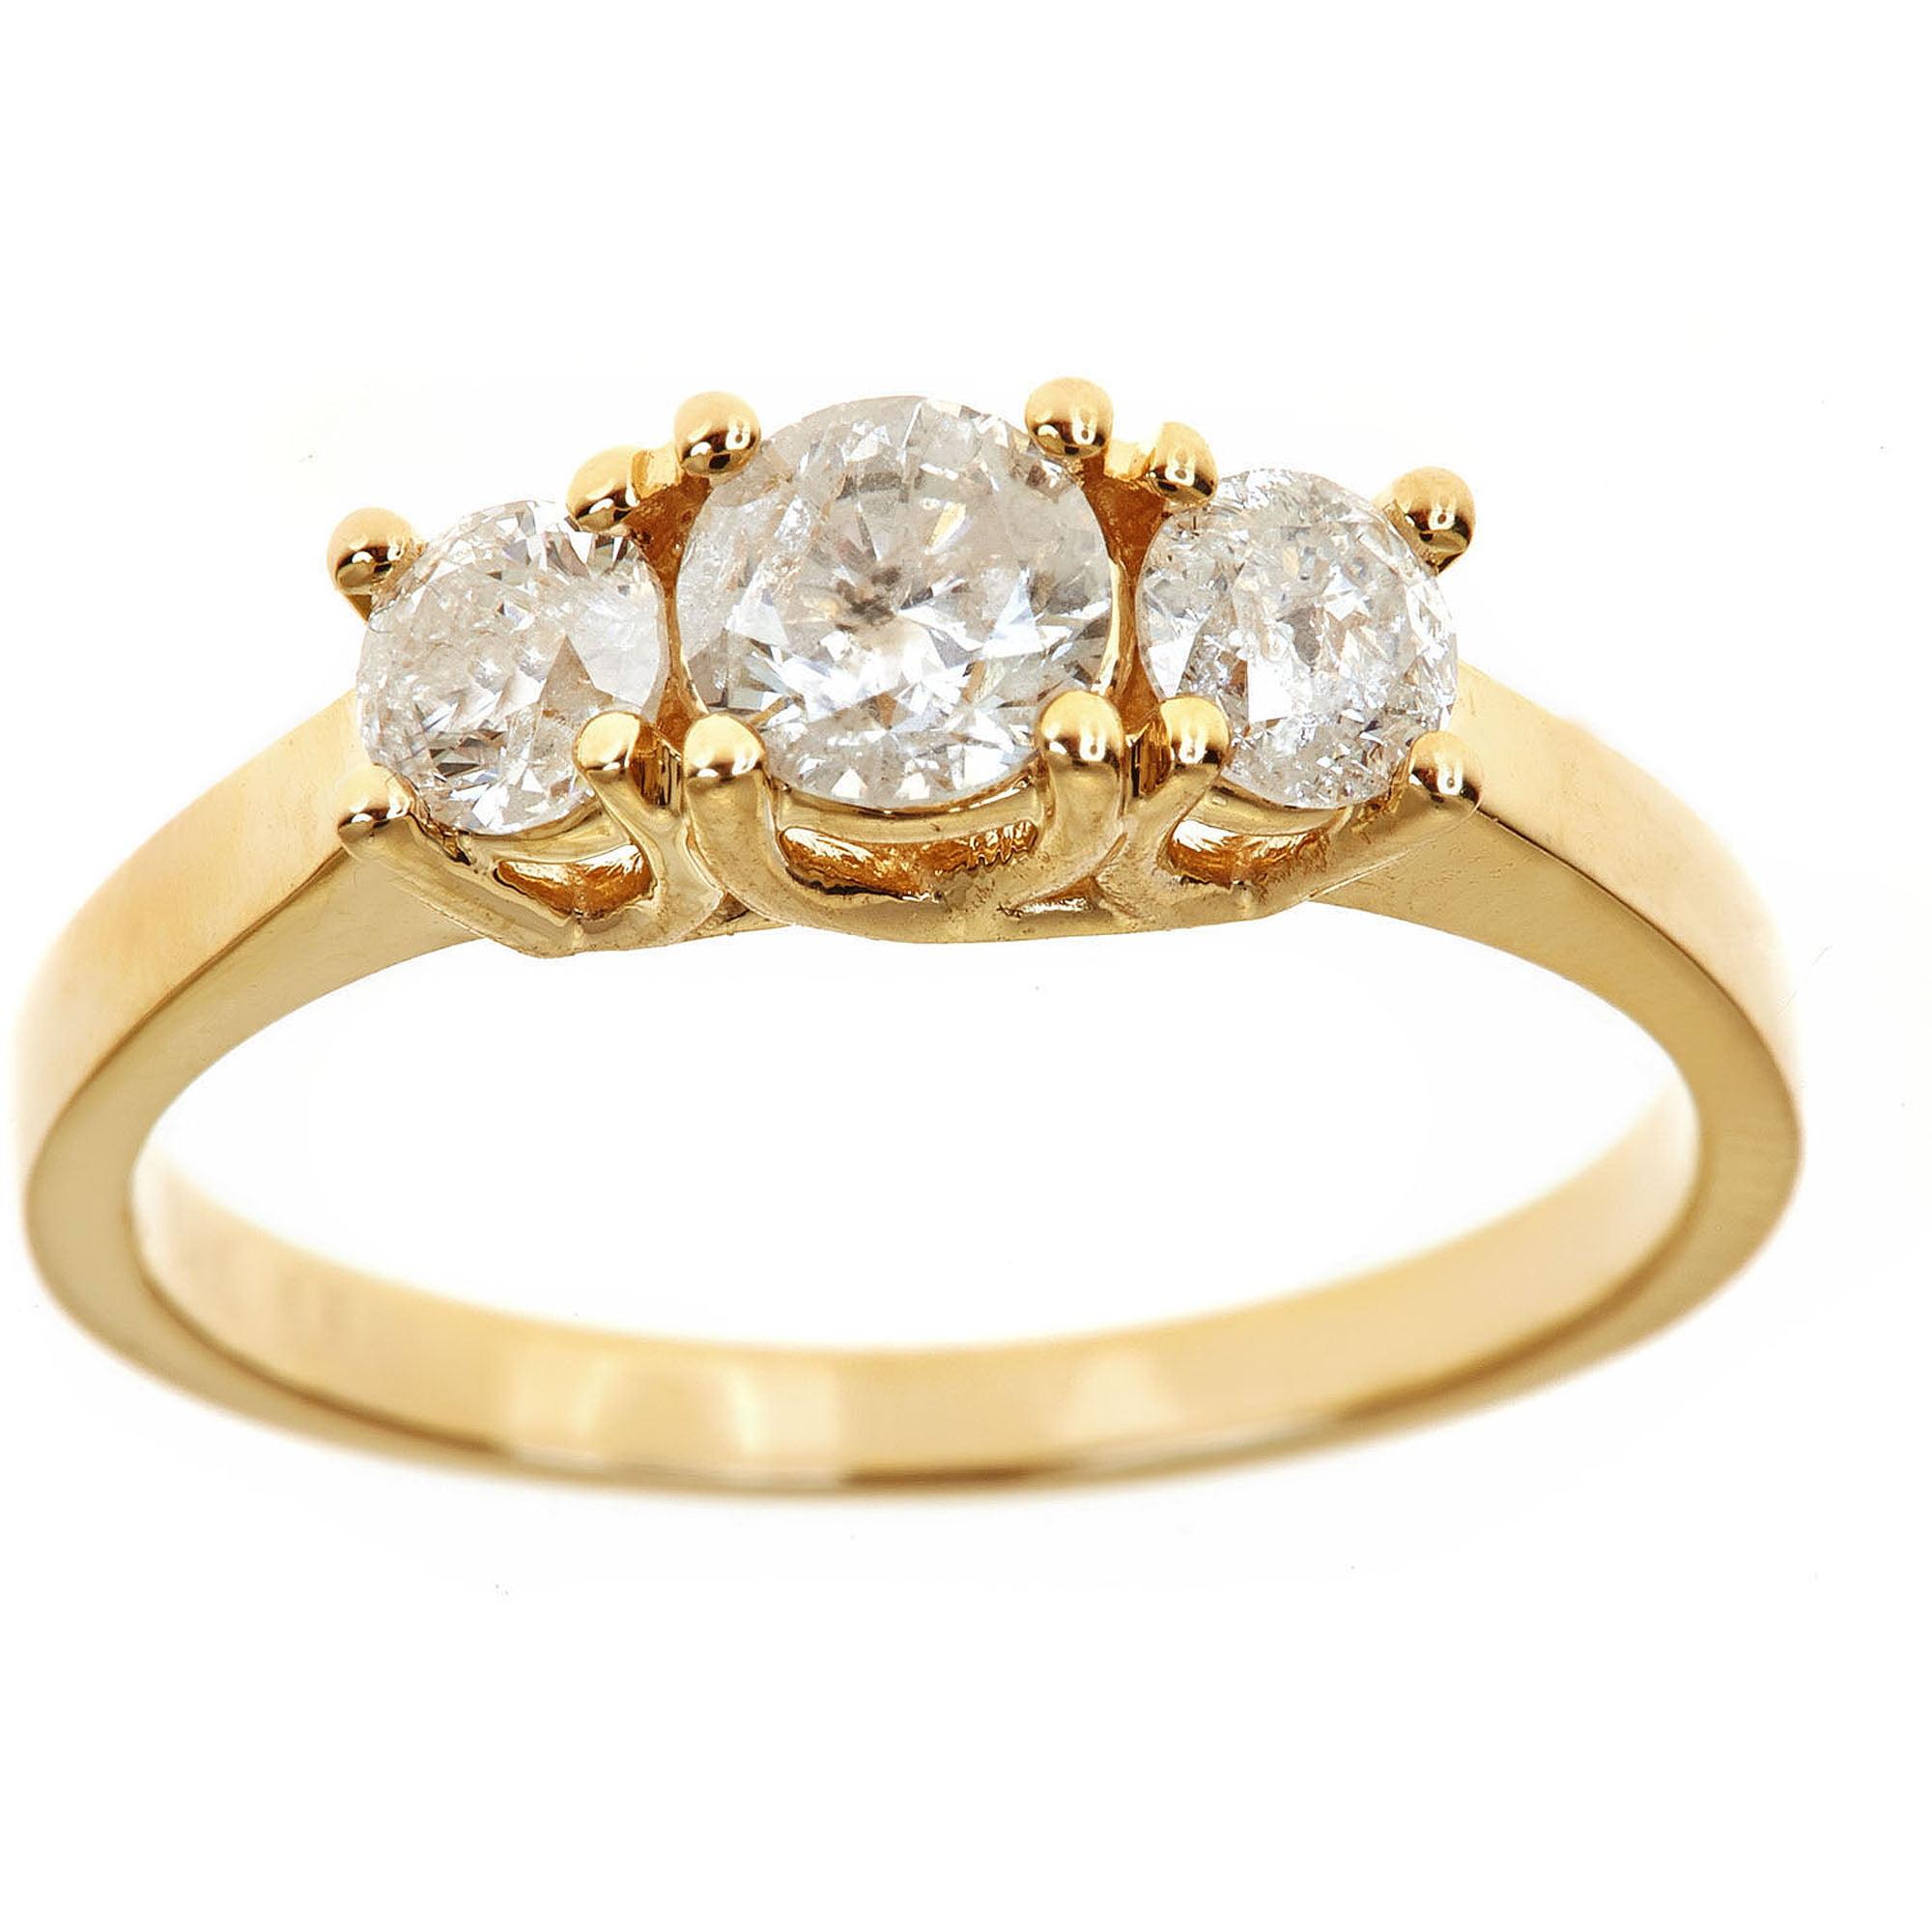 1 Carat T.W. Genuine Round White Diamond 14kt Yellow Gold 3 Stone Ring, IGL Certified